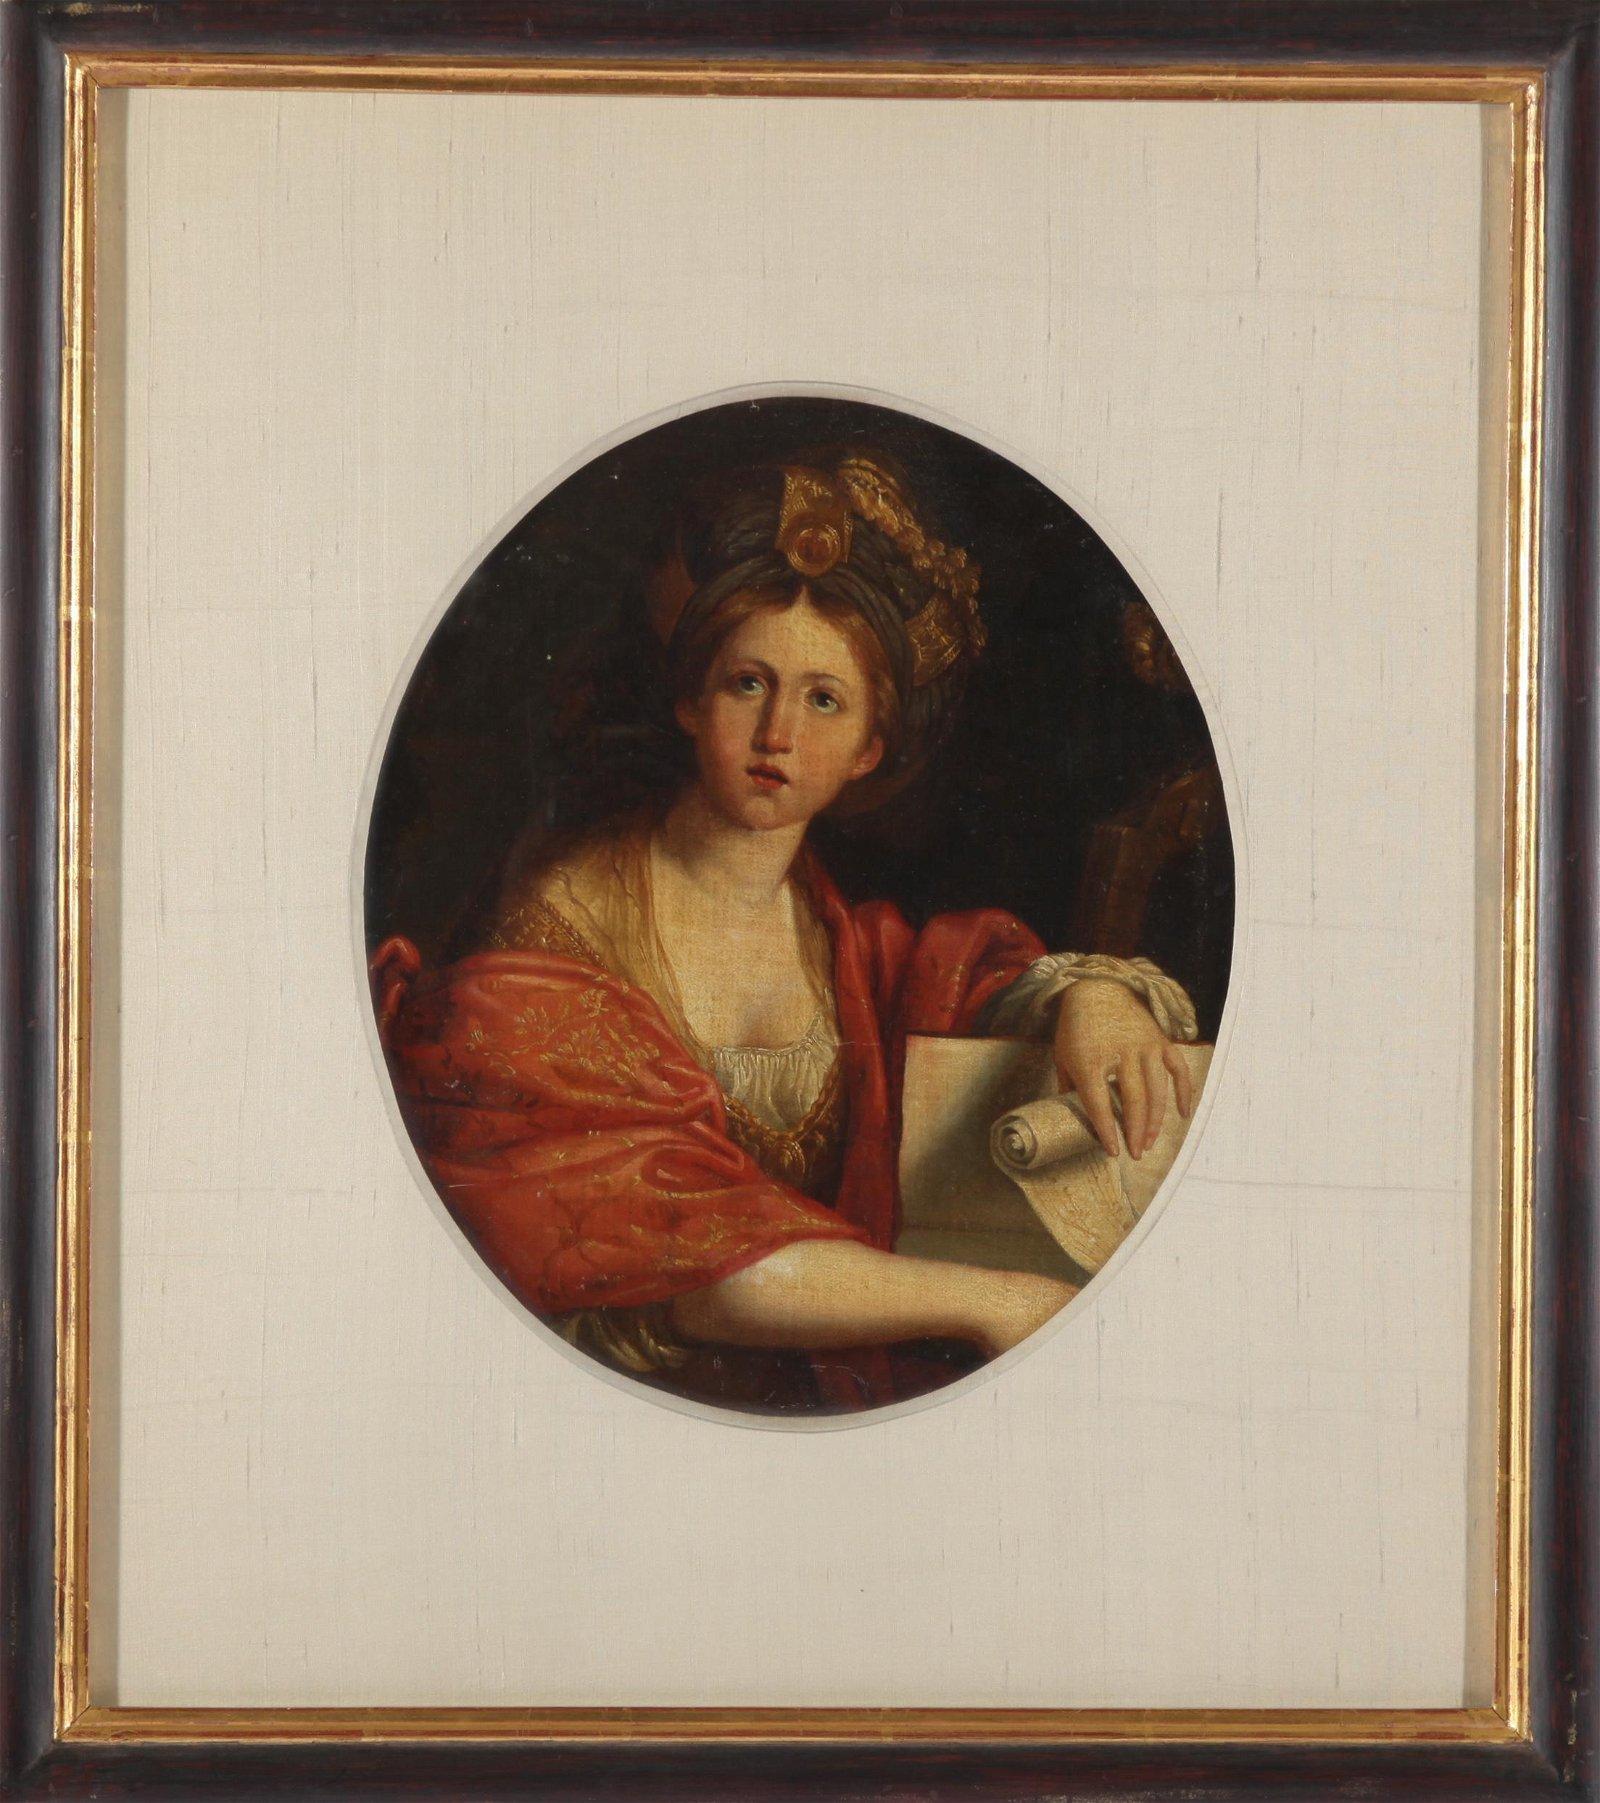 After Domenichino Cumaean Sibyl Oil Painting, 18 C